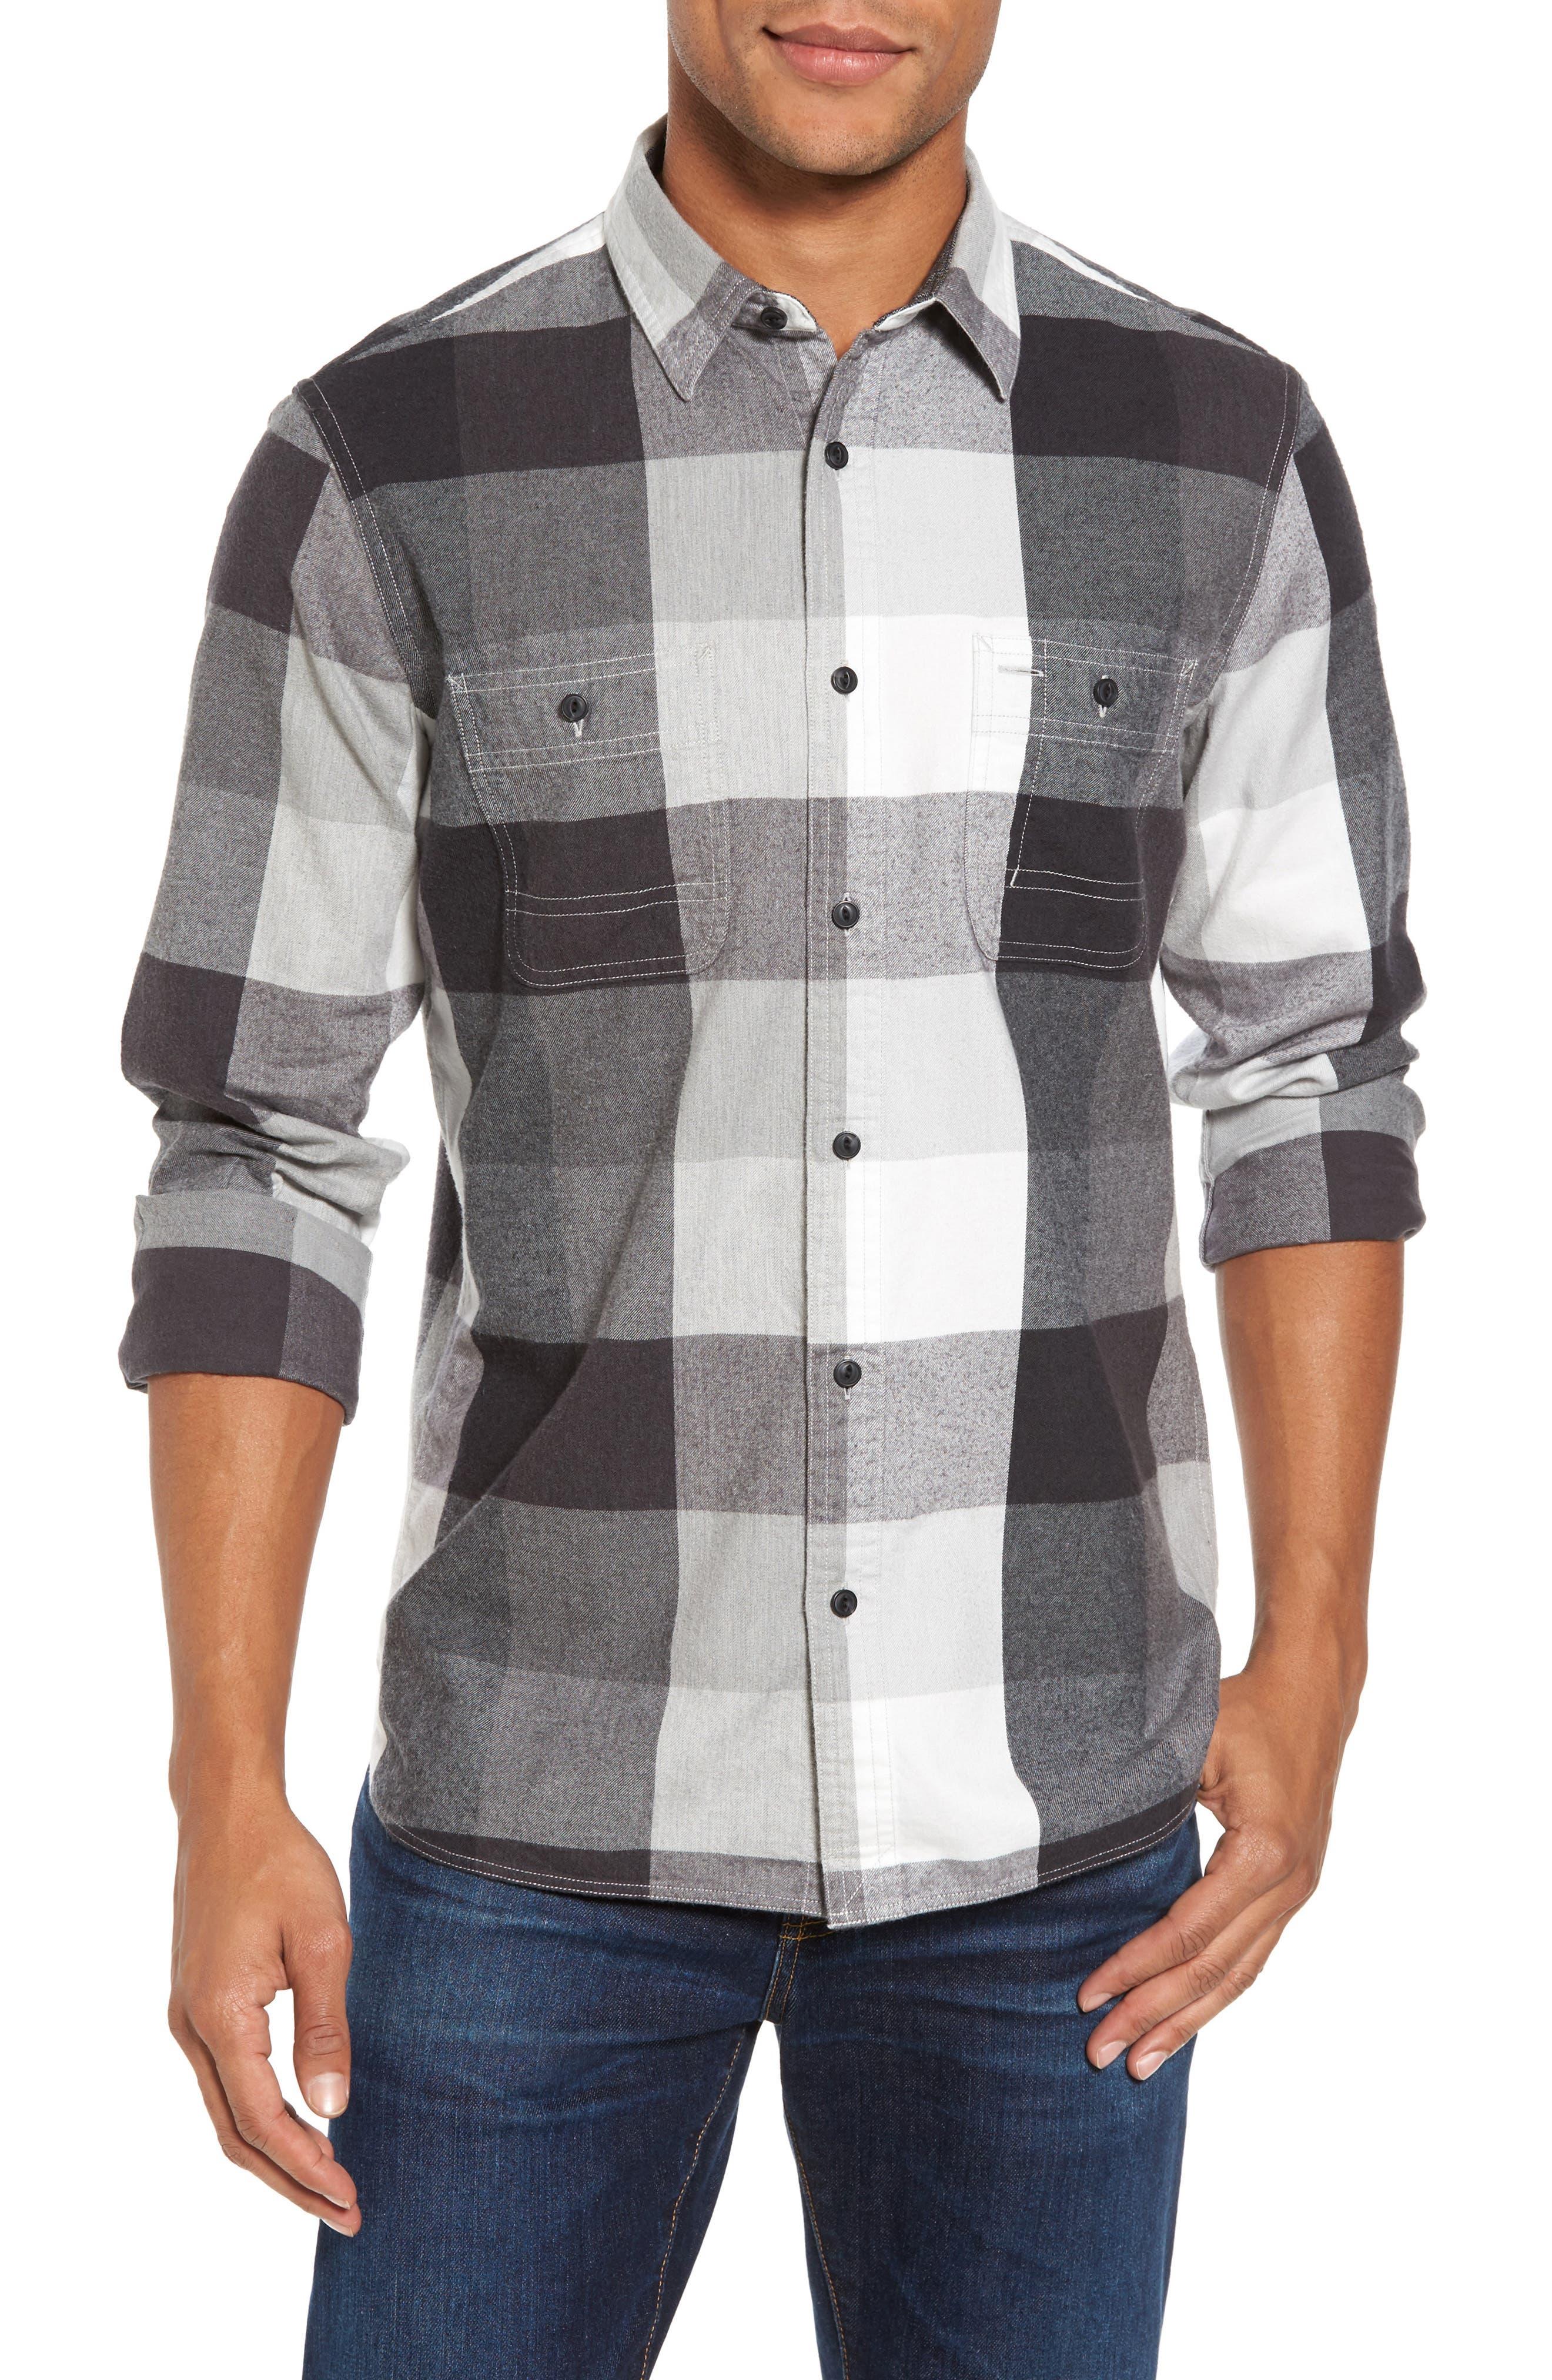 Trim Fit Workwear Check Flannel Shirt,                             Main thumbnail 1, color,                             Grey Paloma Buffalo Plaid